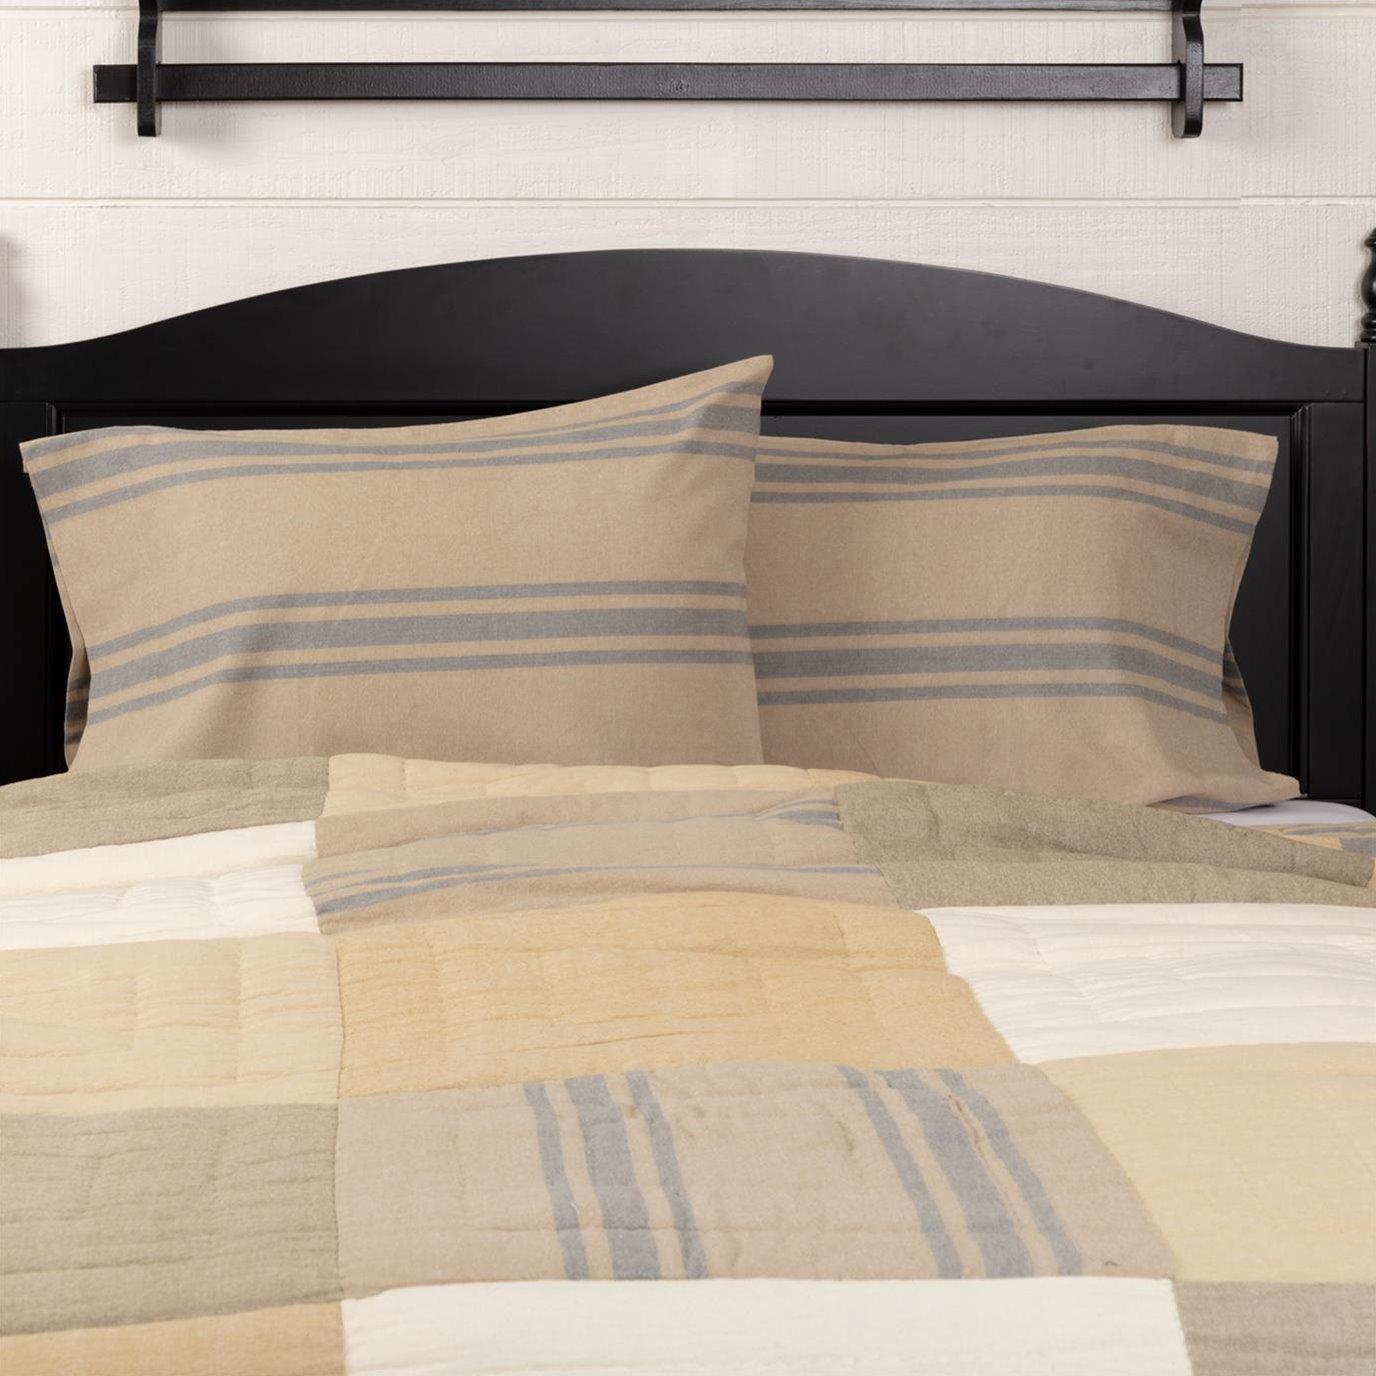 Farmer's Market Grain Sack Stripe Standard Pillow Case Set of 2 21x30